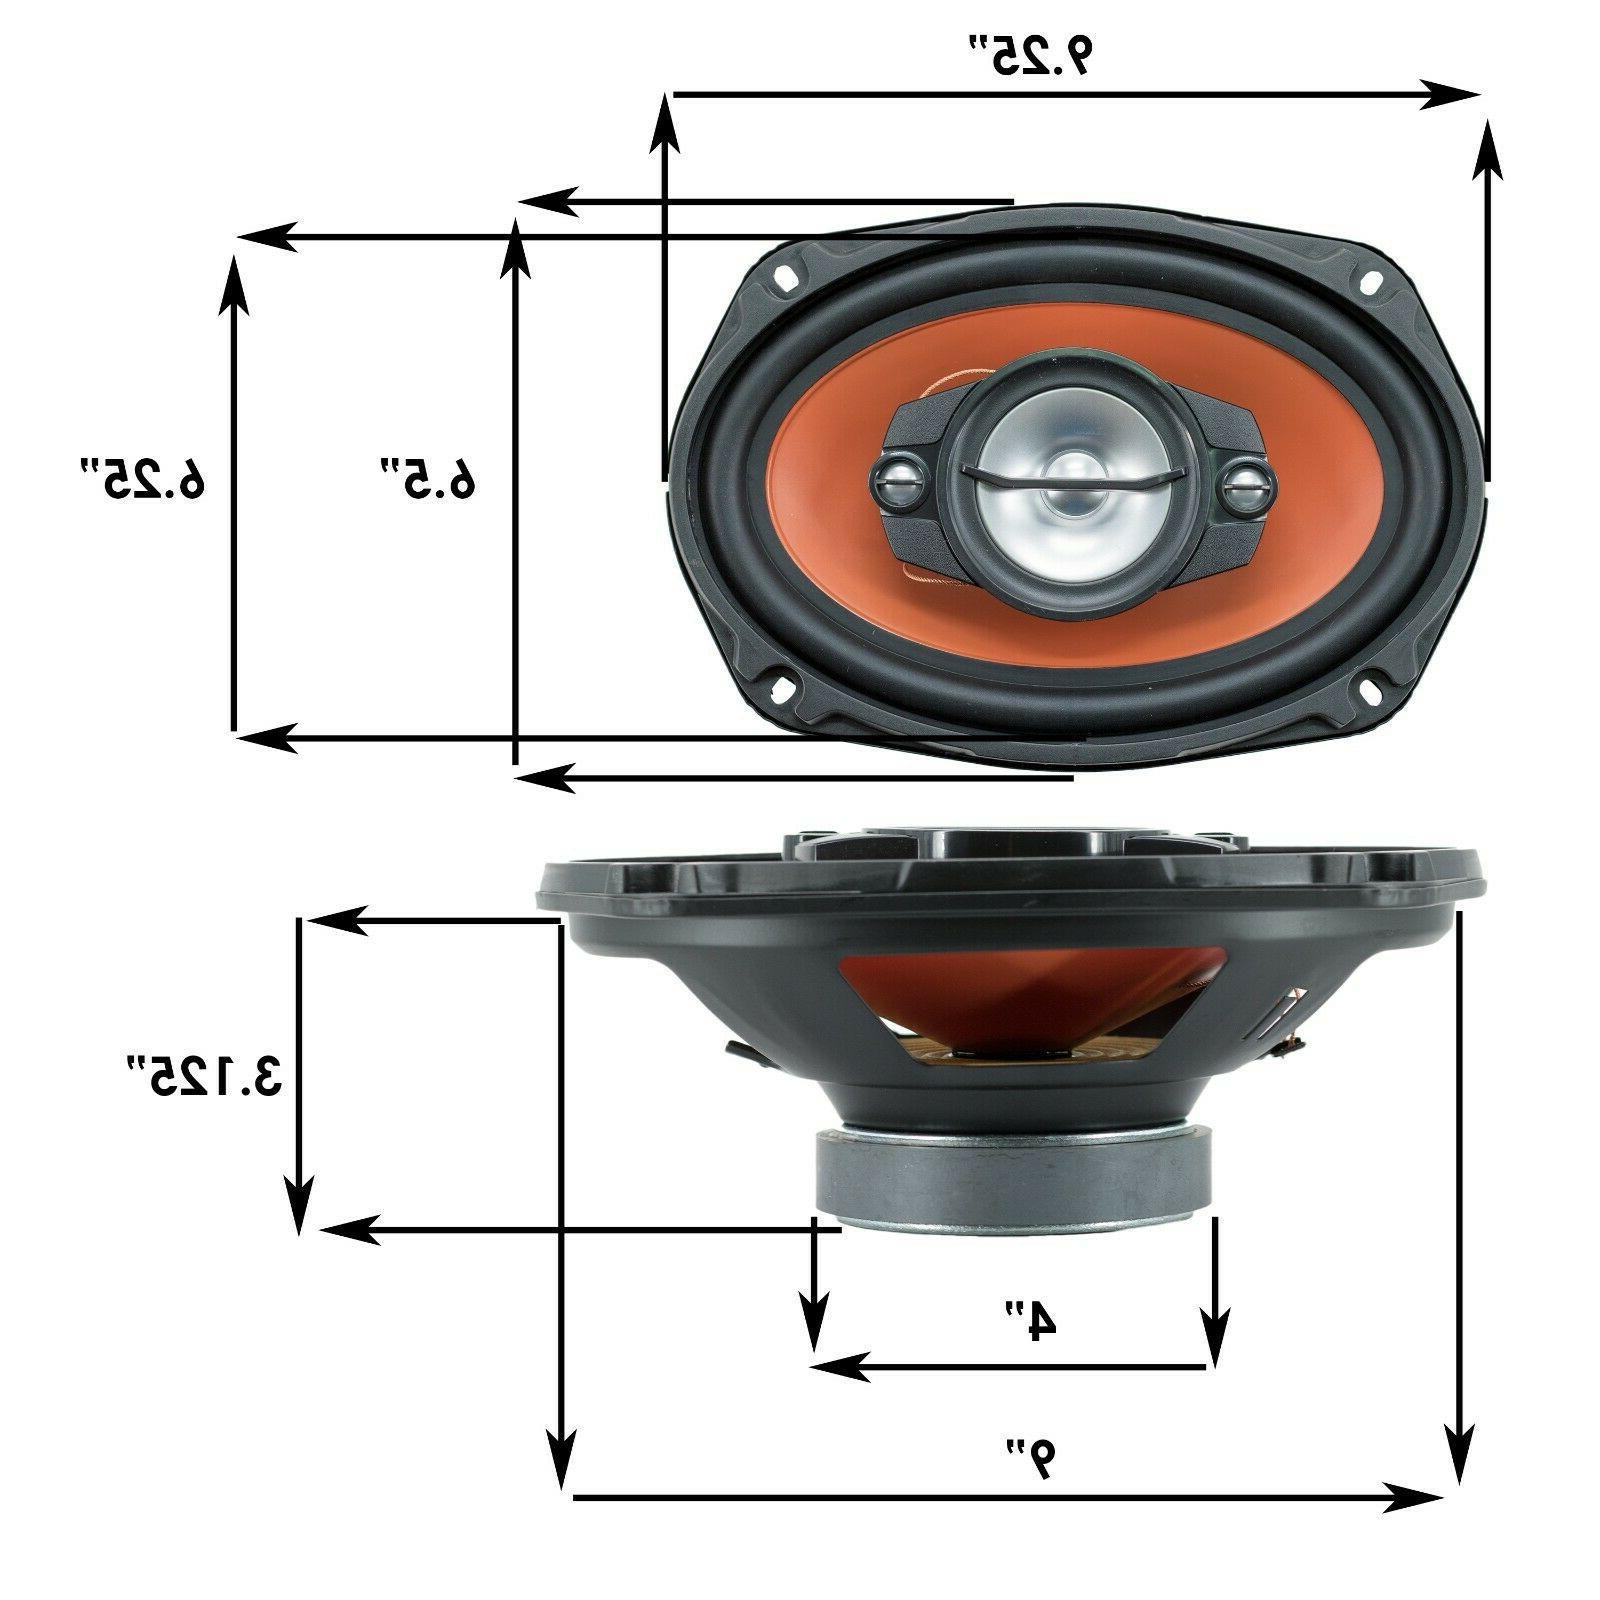 2) Audiobank Watt Car Stereo - AB790